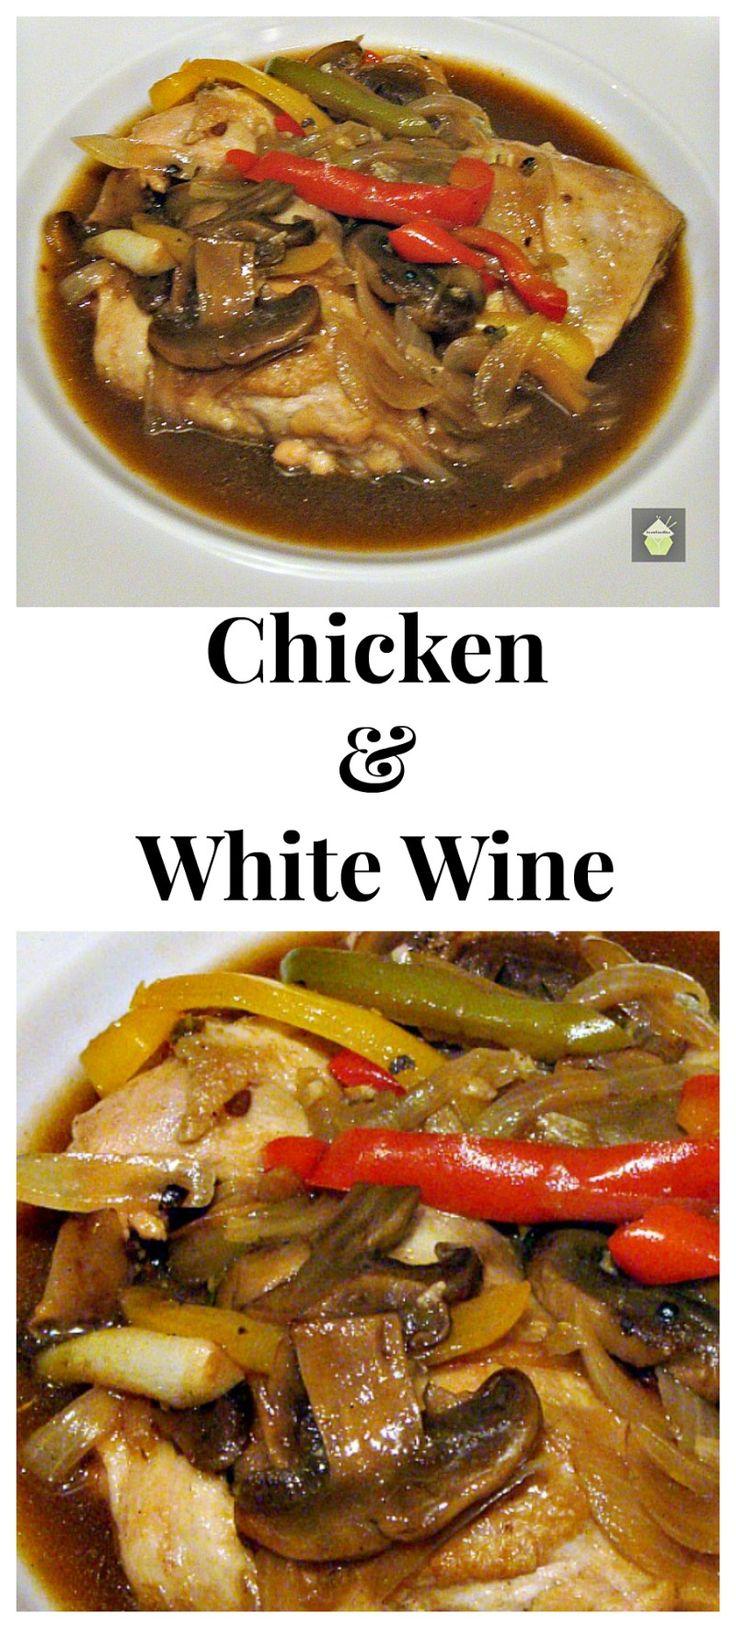 ... Chicken In White Wine on Pinterest | White wine sauces, Wine sauce and